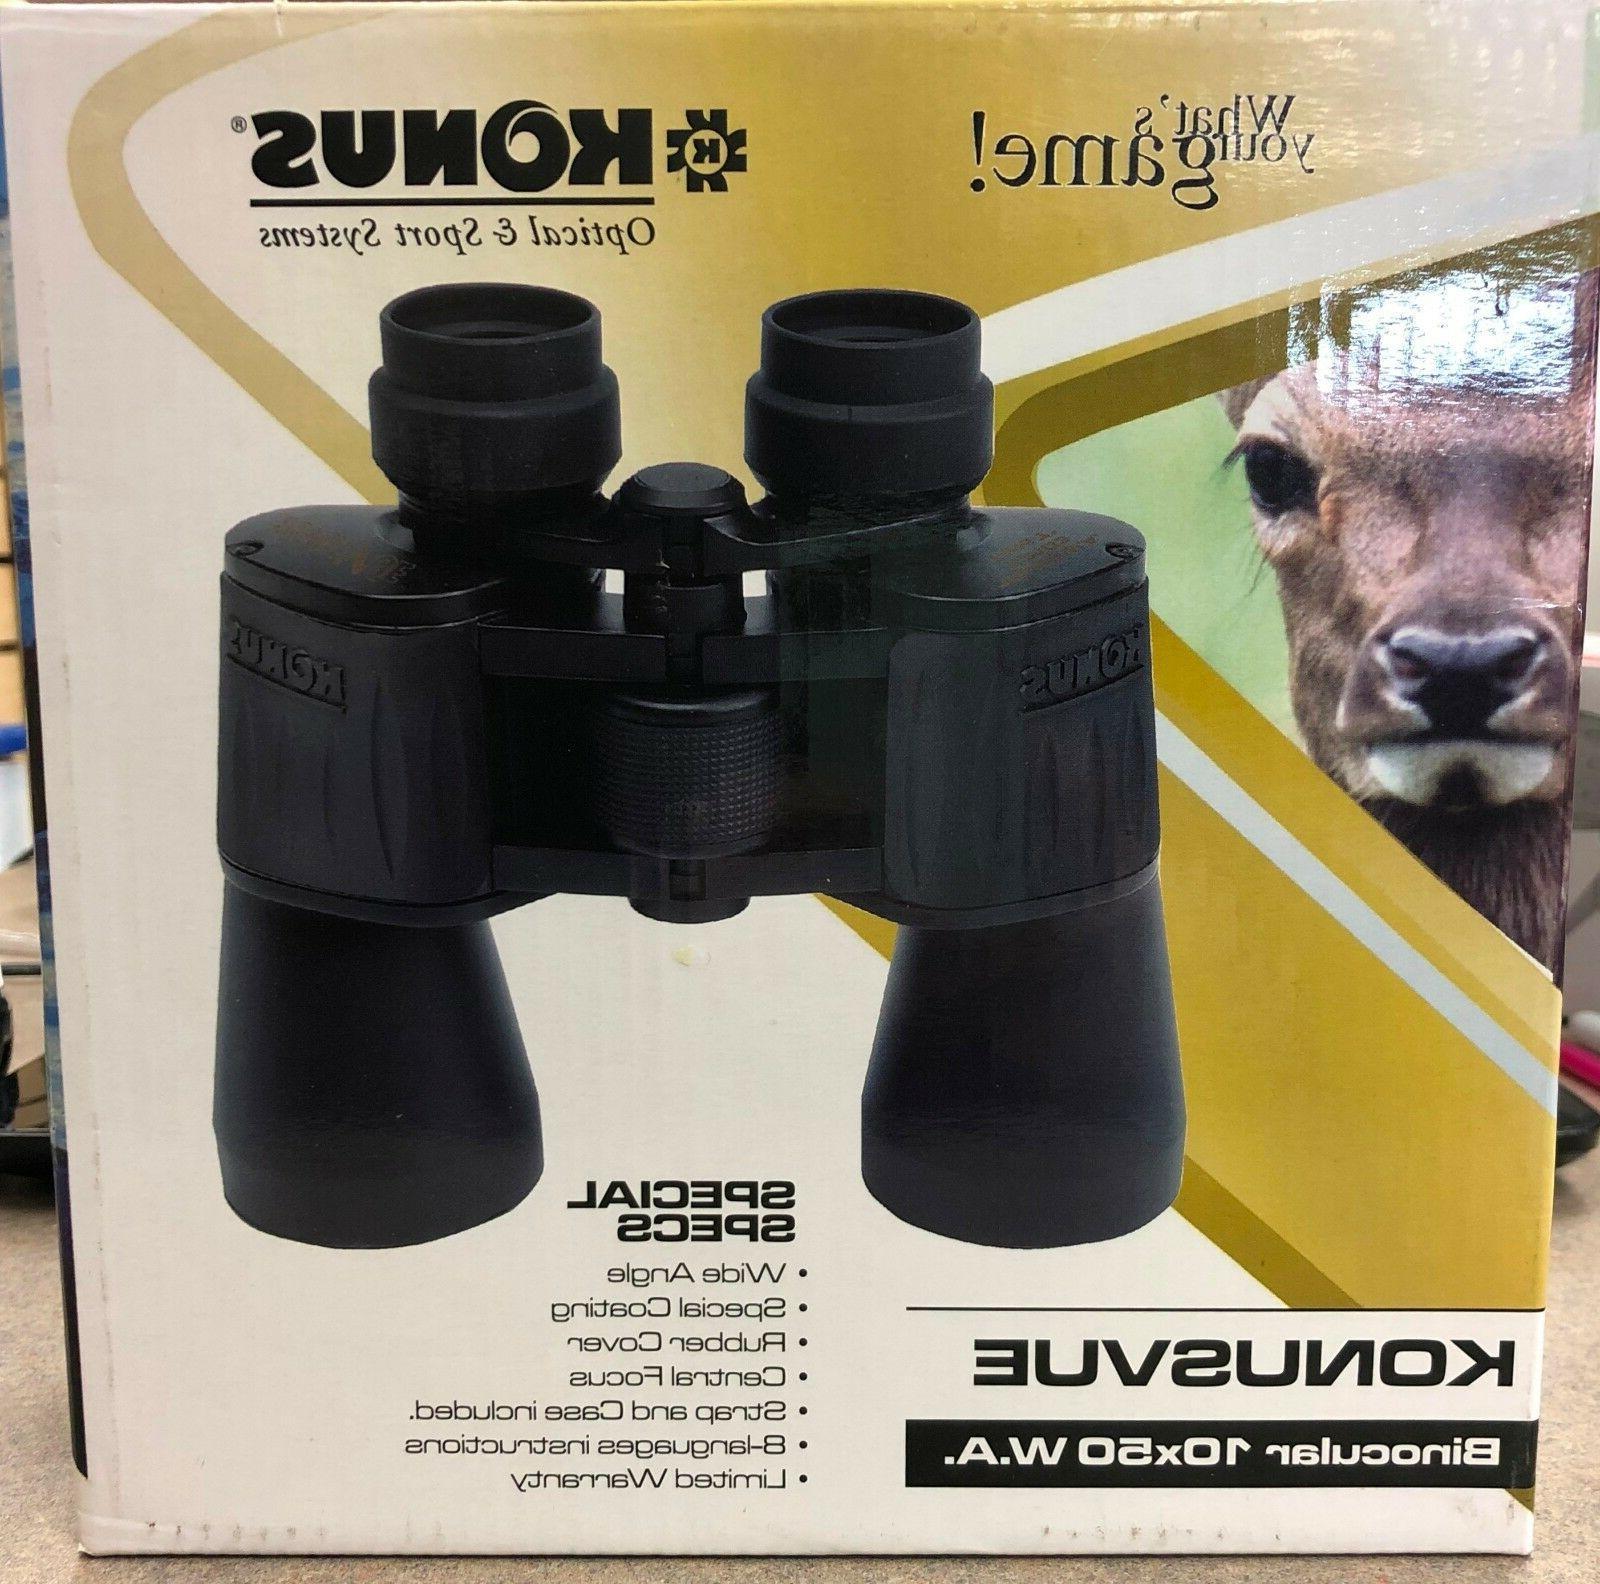 vue binocular 10x50 2103